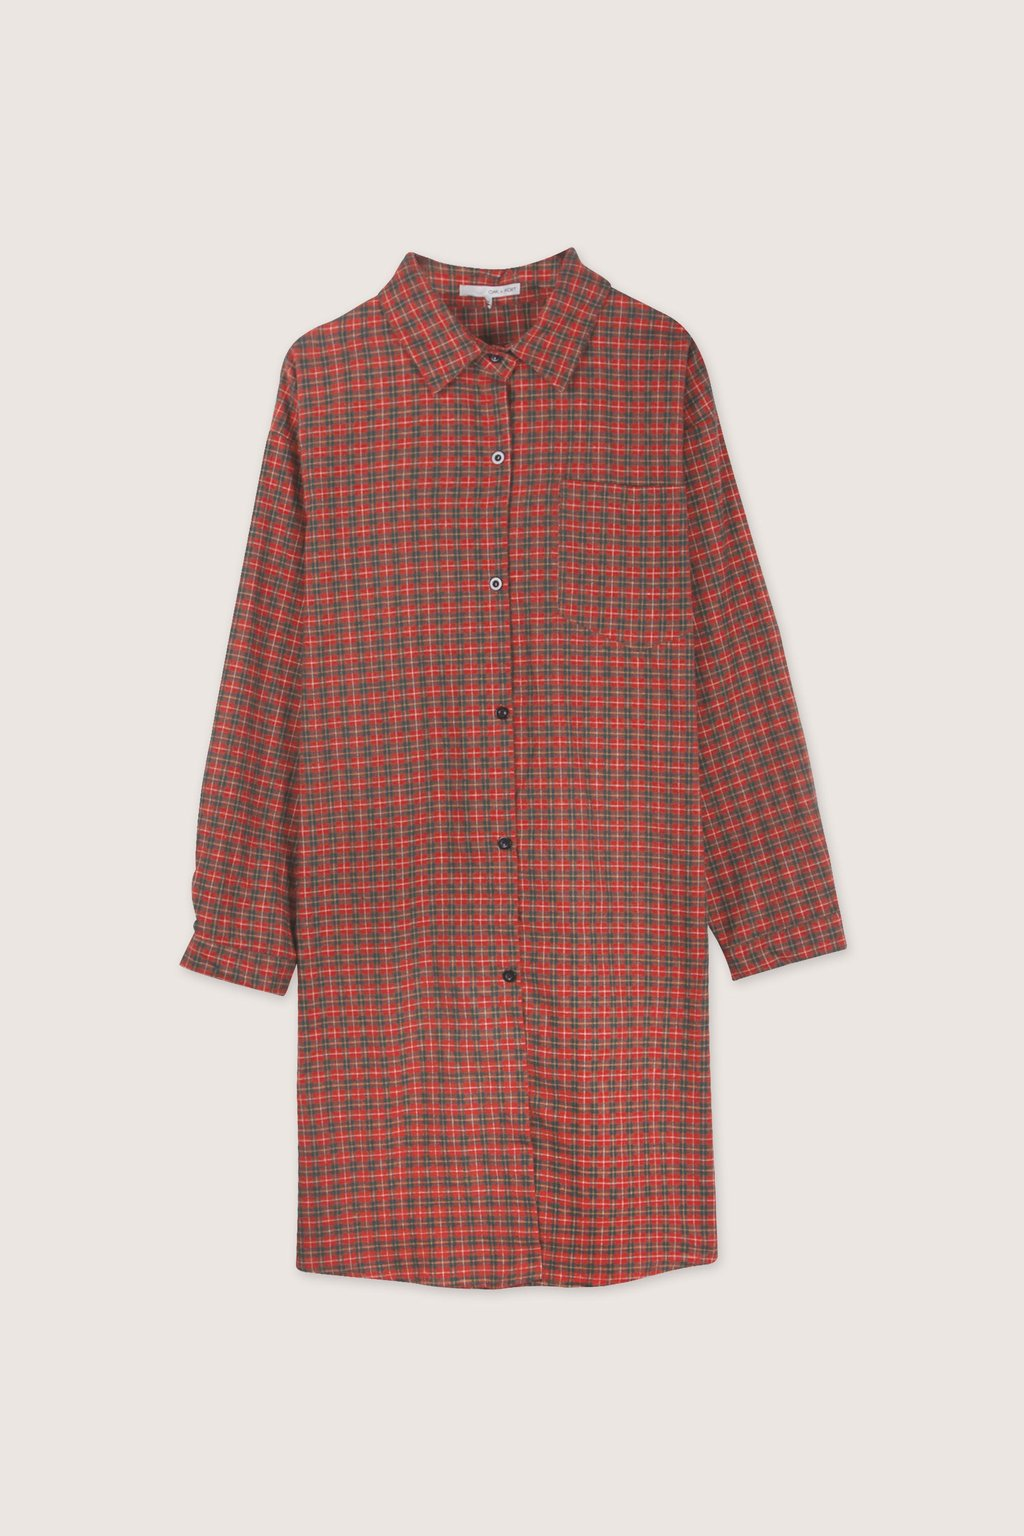 Dress H263 Red 7